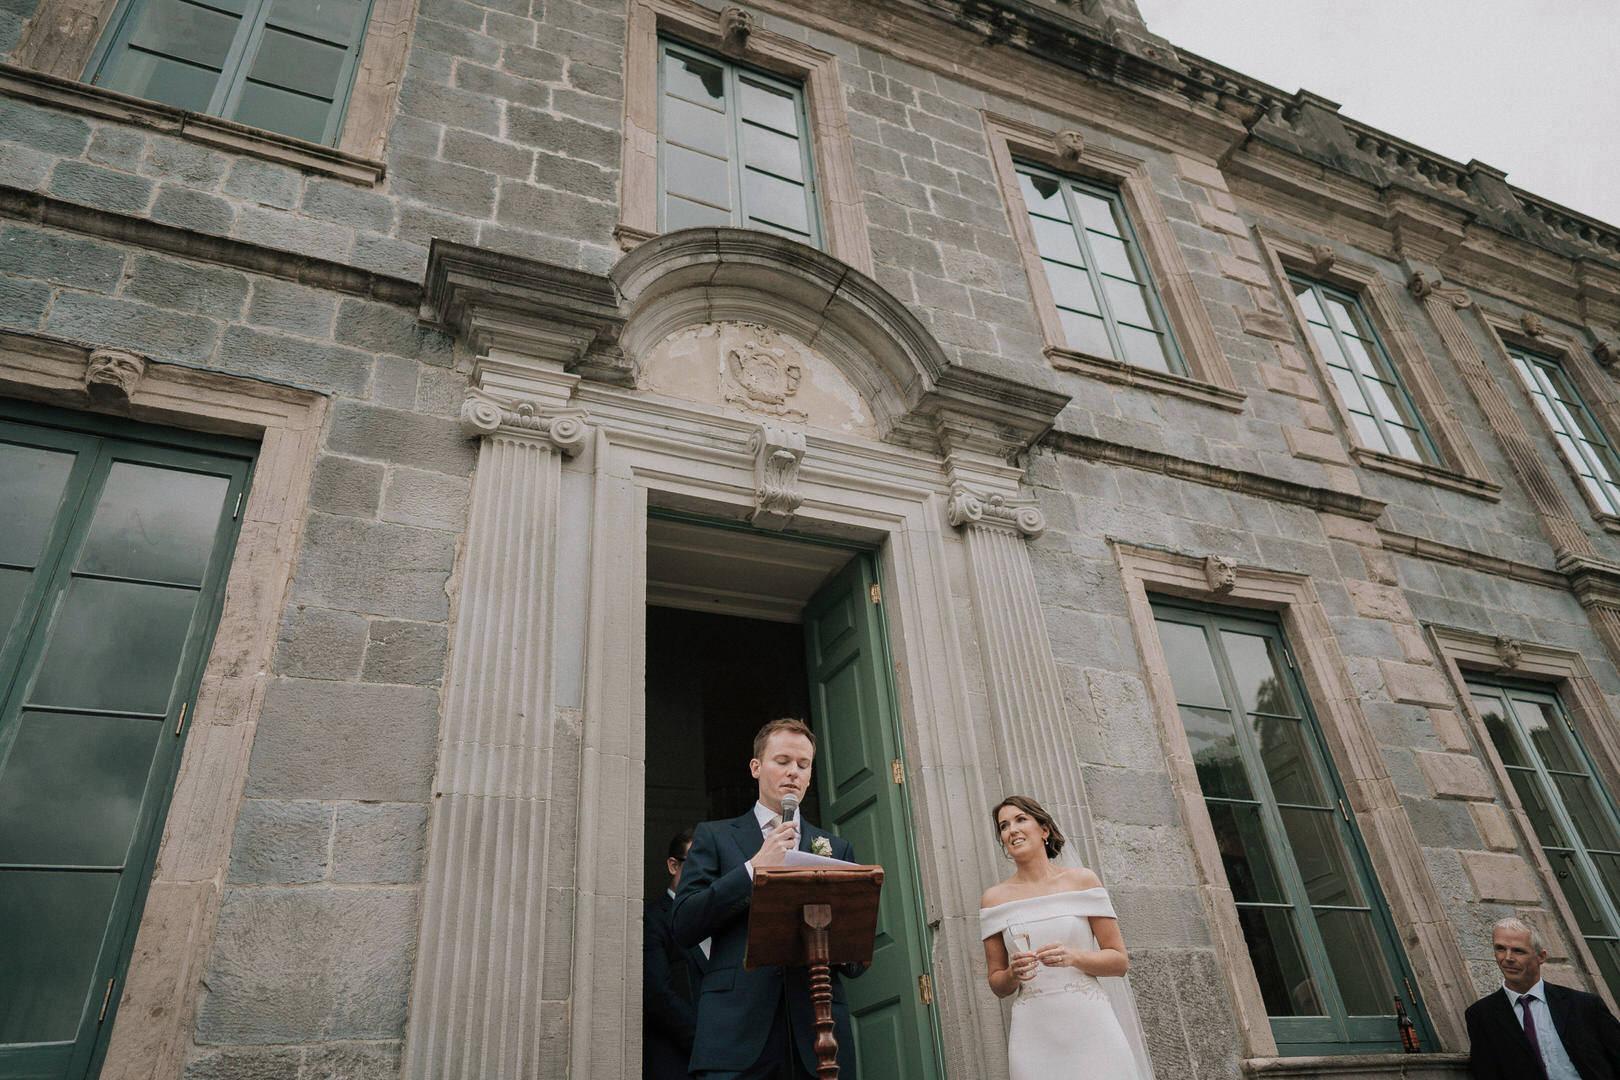 Gloster-House-wedding-photos15 15